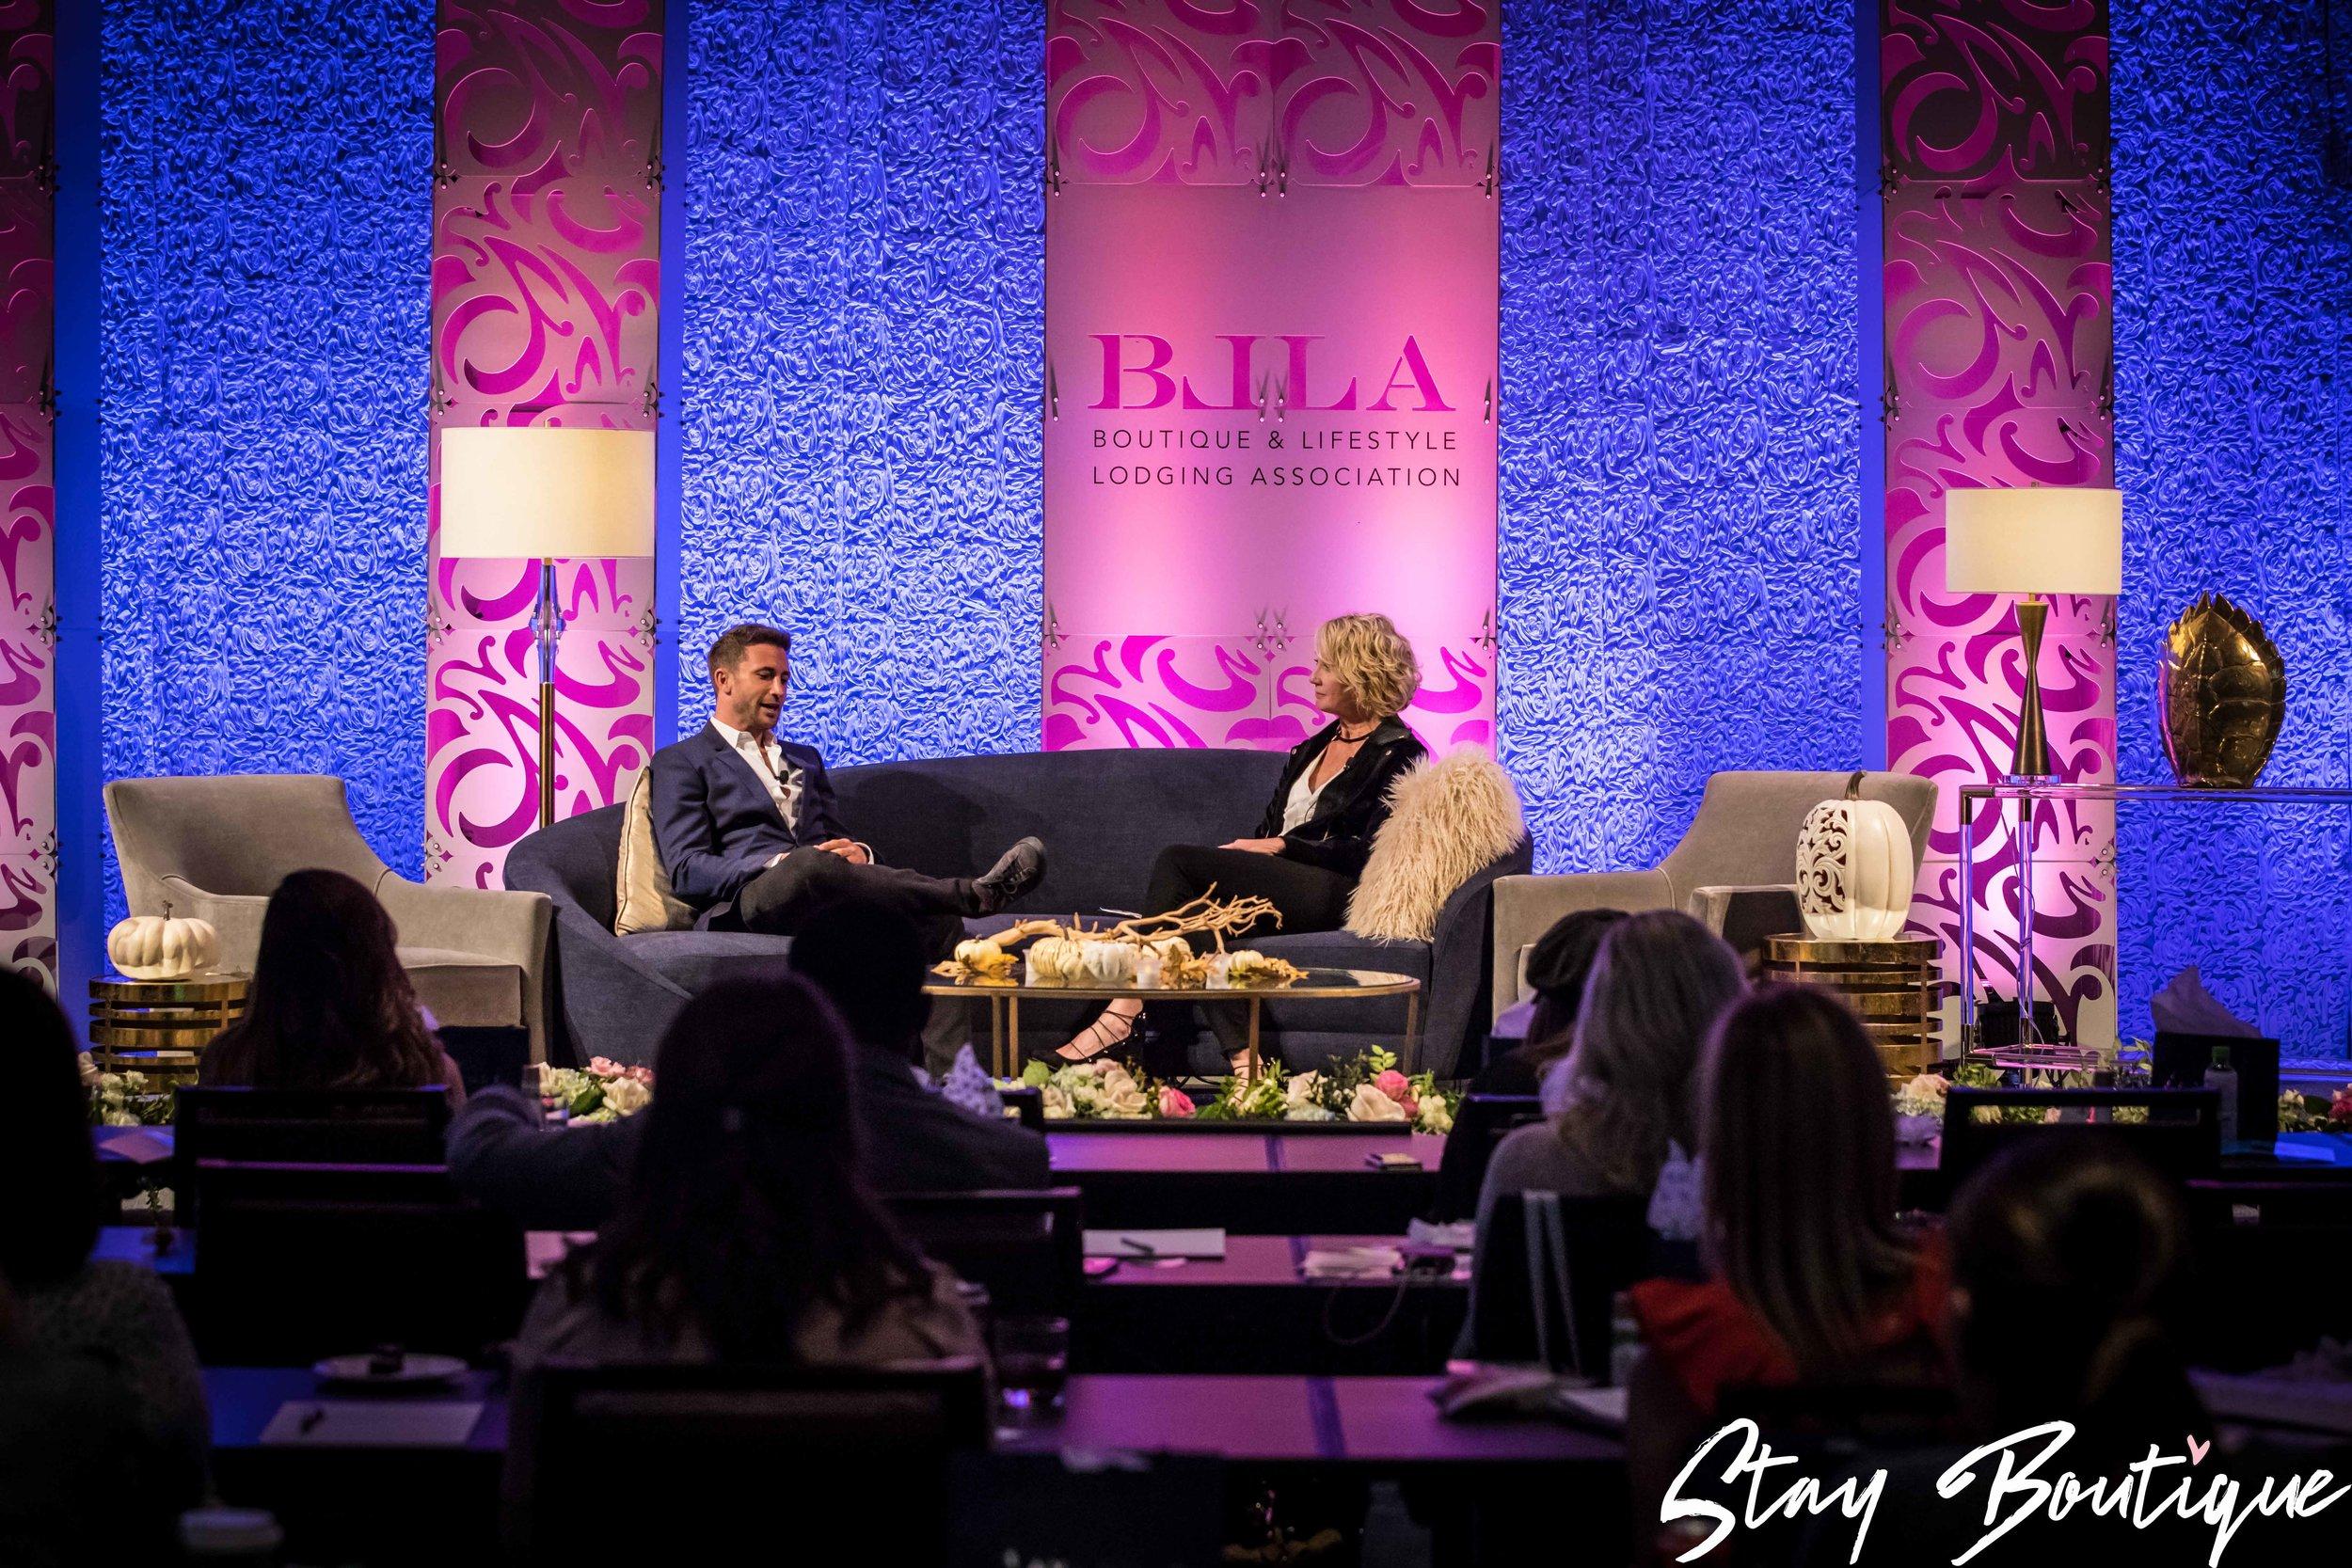 David Fishbein Paula Oblen Runyon Stay Boutique BLLA Conference0799.jpg